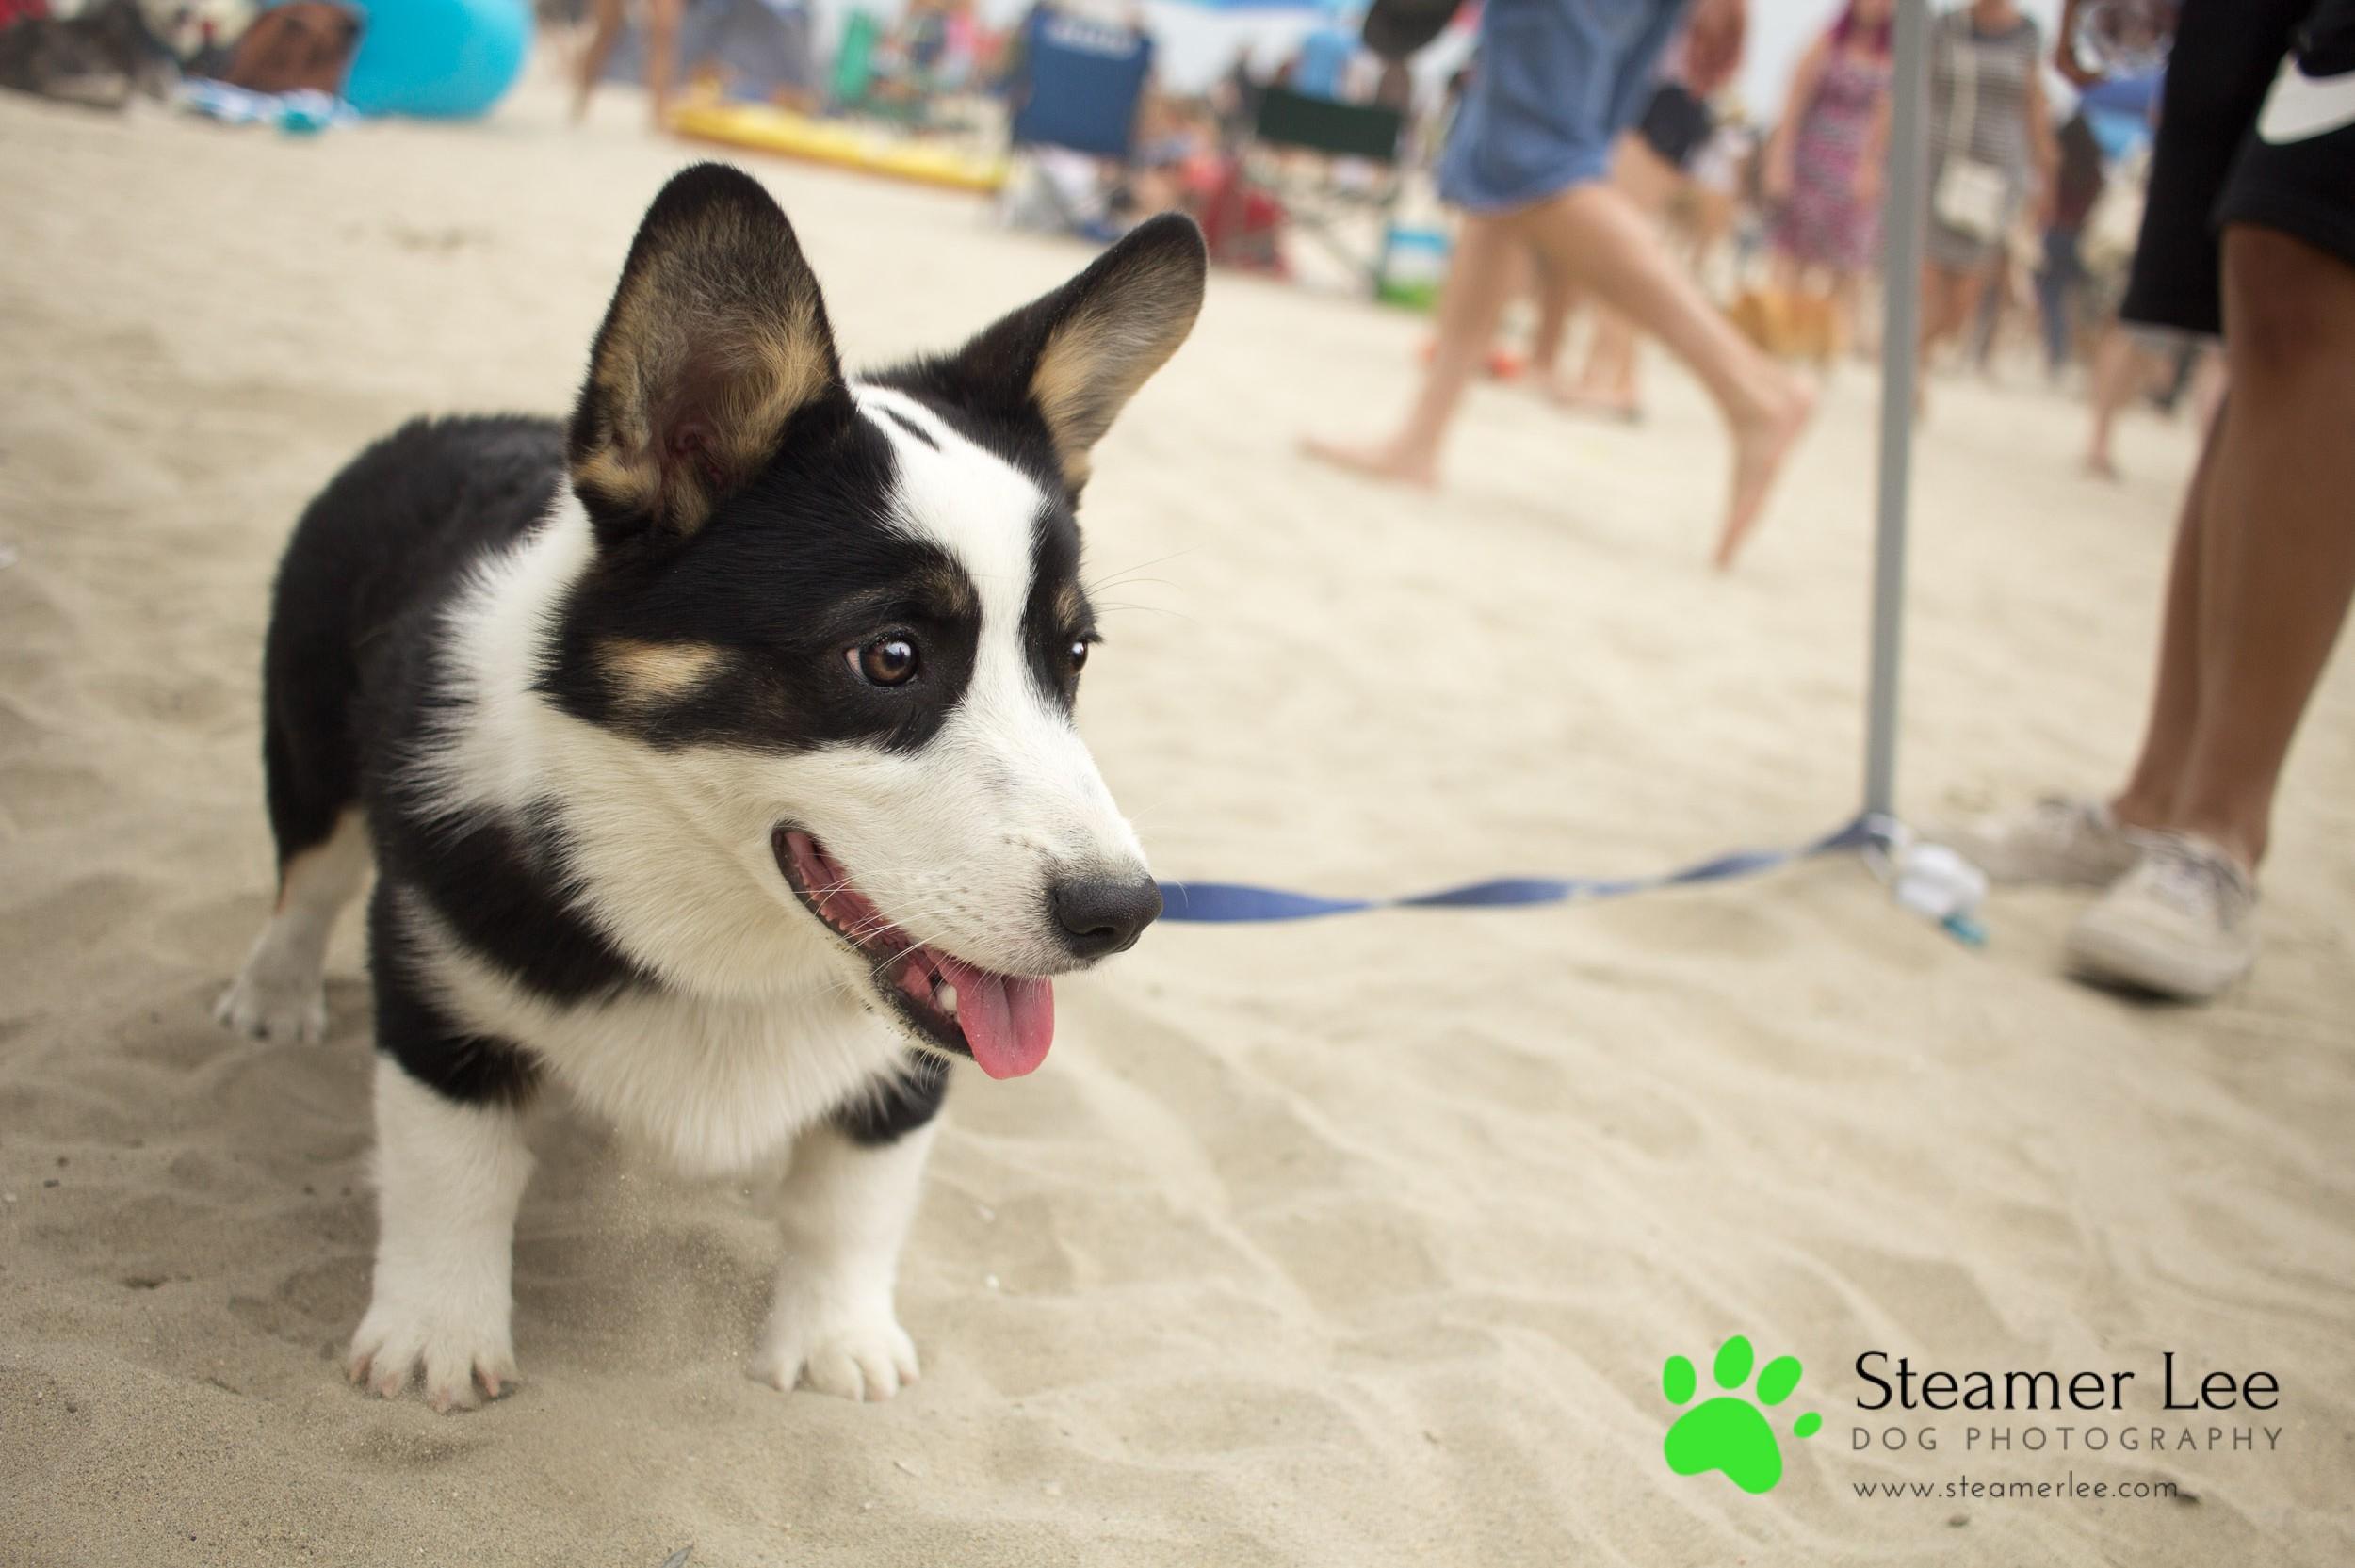 Steamer Lee Dog Photography - July 2017 So Cal Corgi Beach Day - Vol. 3 - 5.jpg